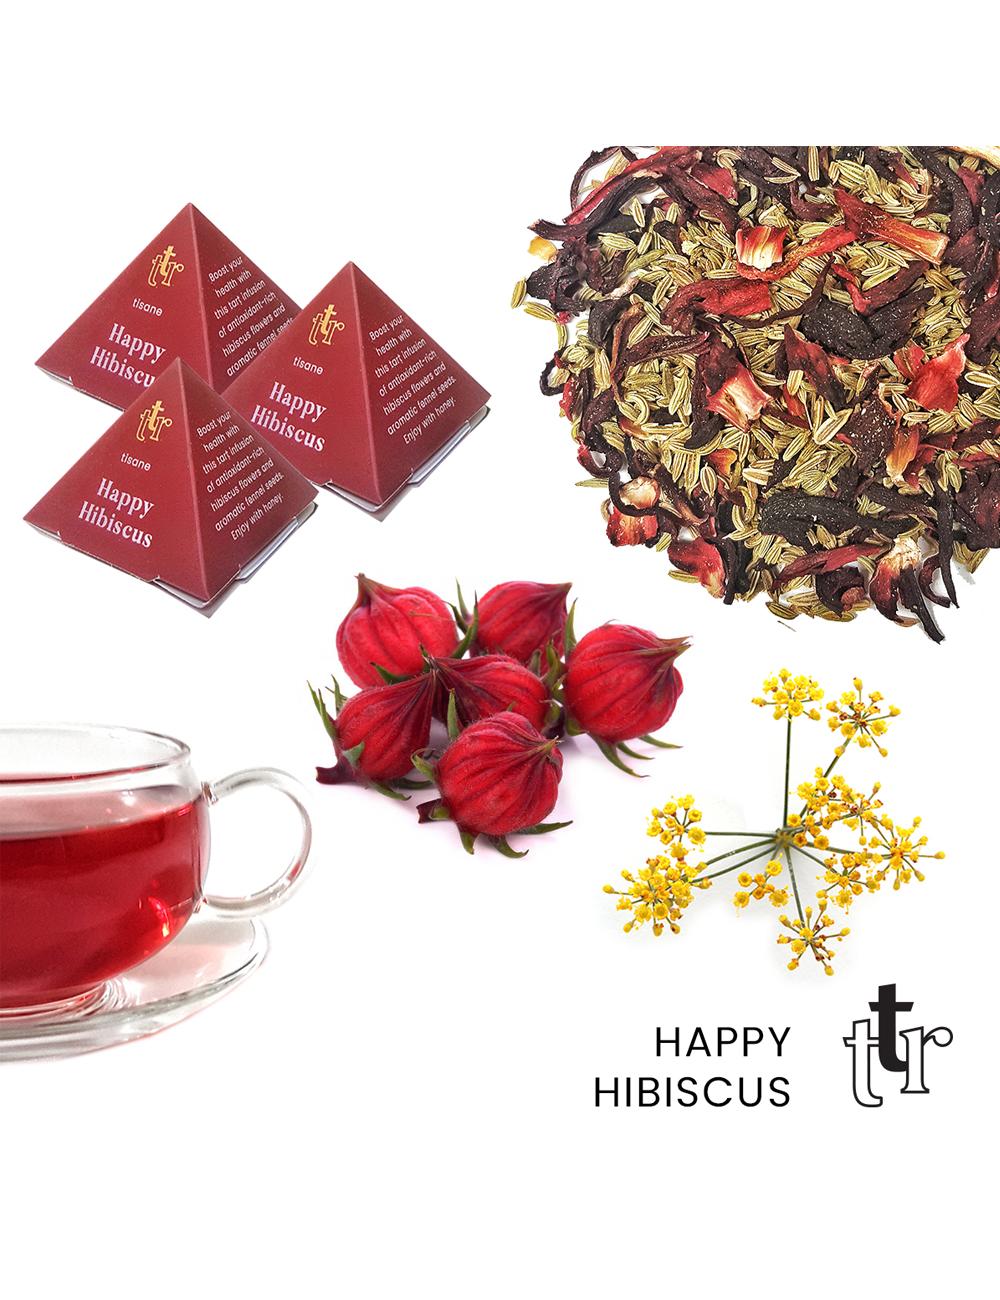 Loose Leaf Tea Happy Hibiscus